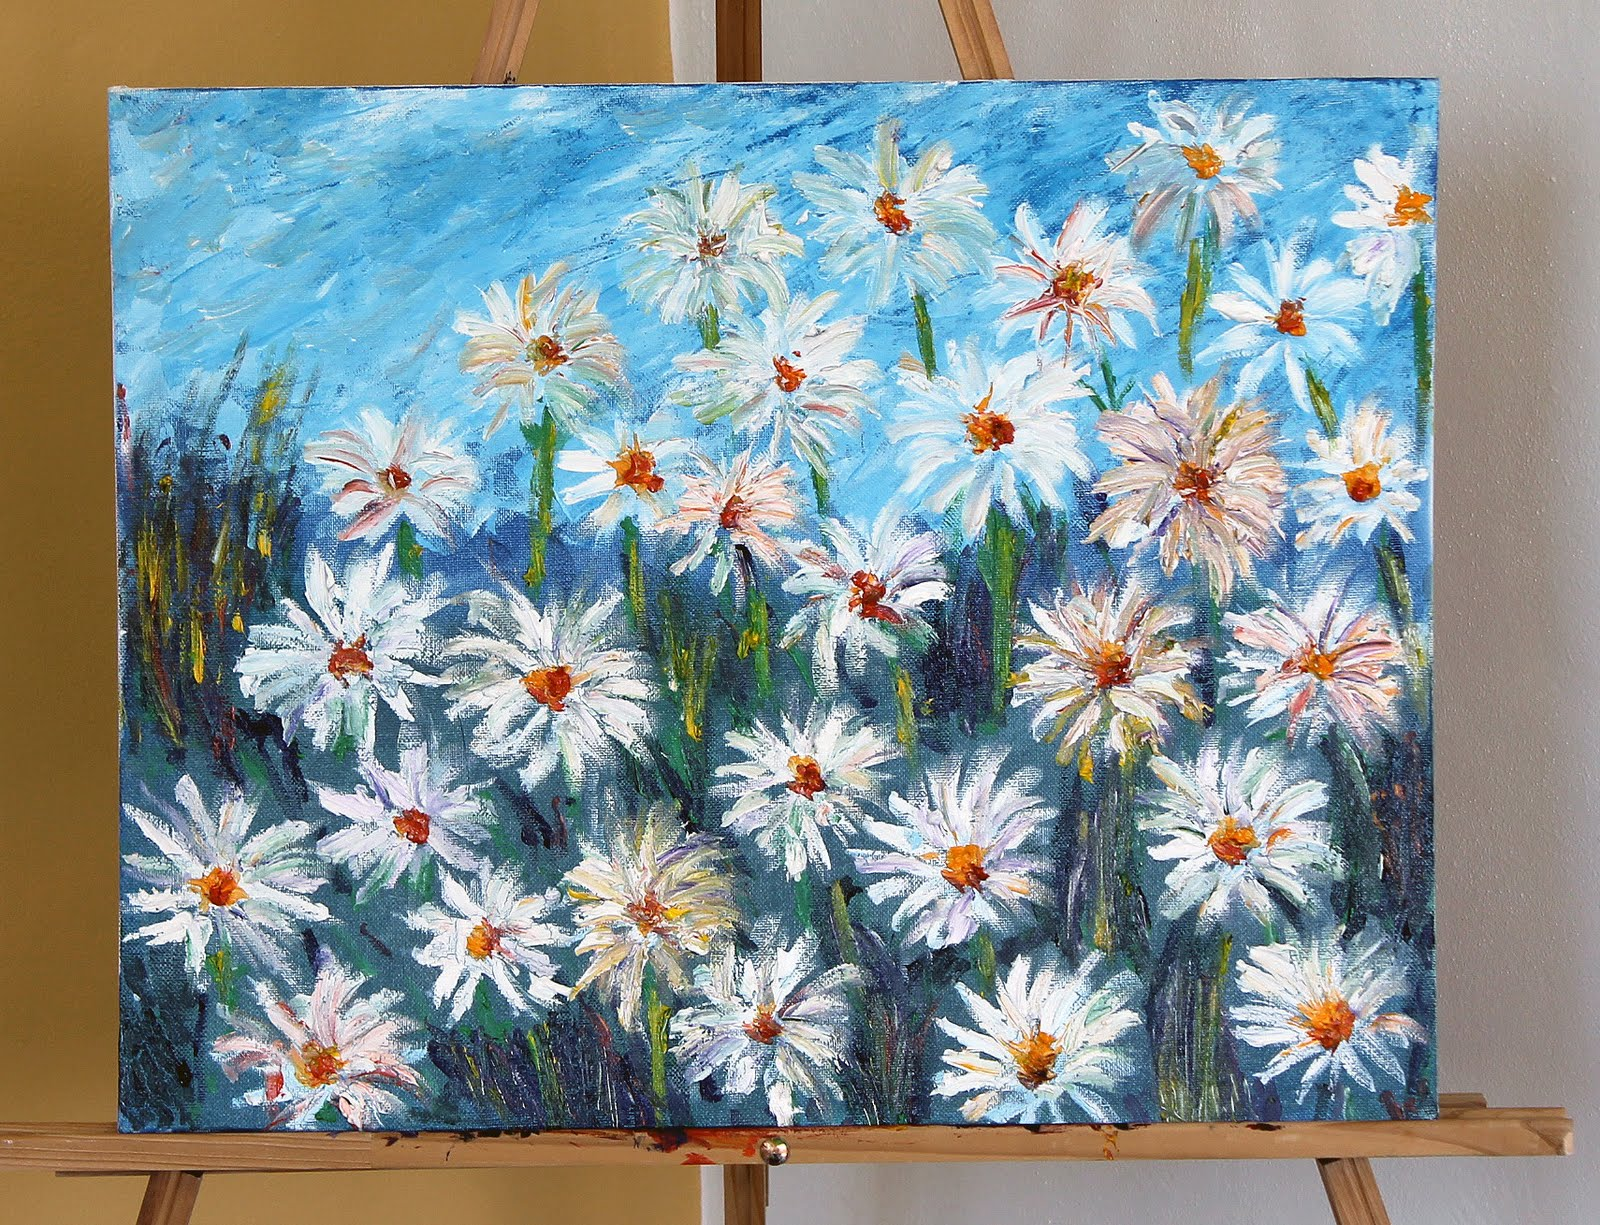 Om oil painting